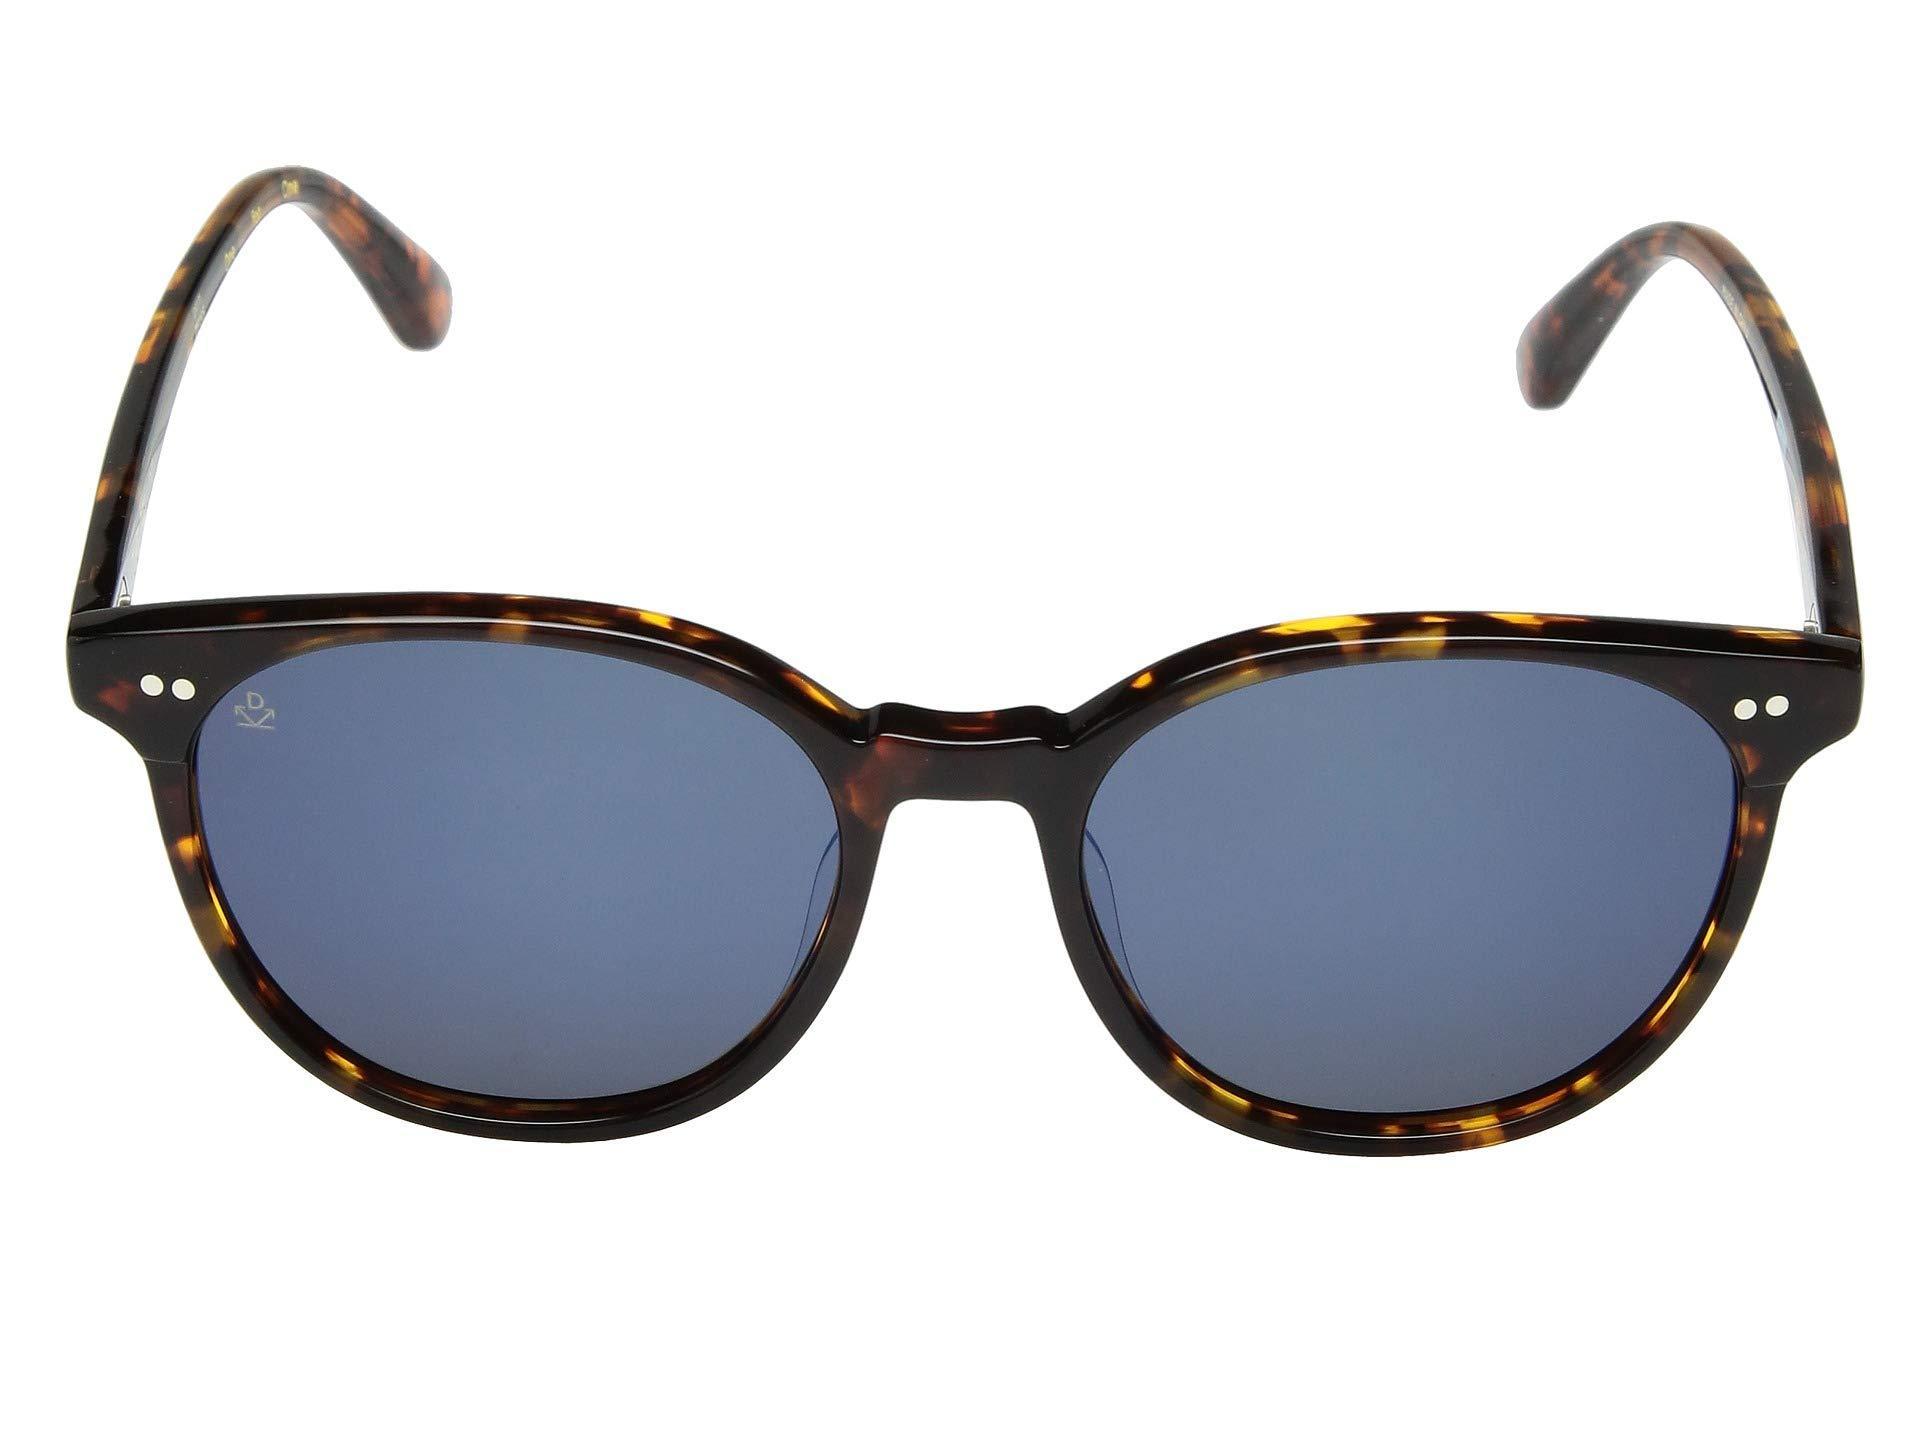 84cf45d73d TOMS - Multicolor Bellini Zeiss (whiskey Tortoise) Fashion Sunglasses -  Lyst. View fullscreen